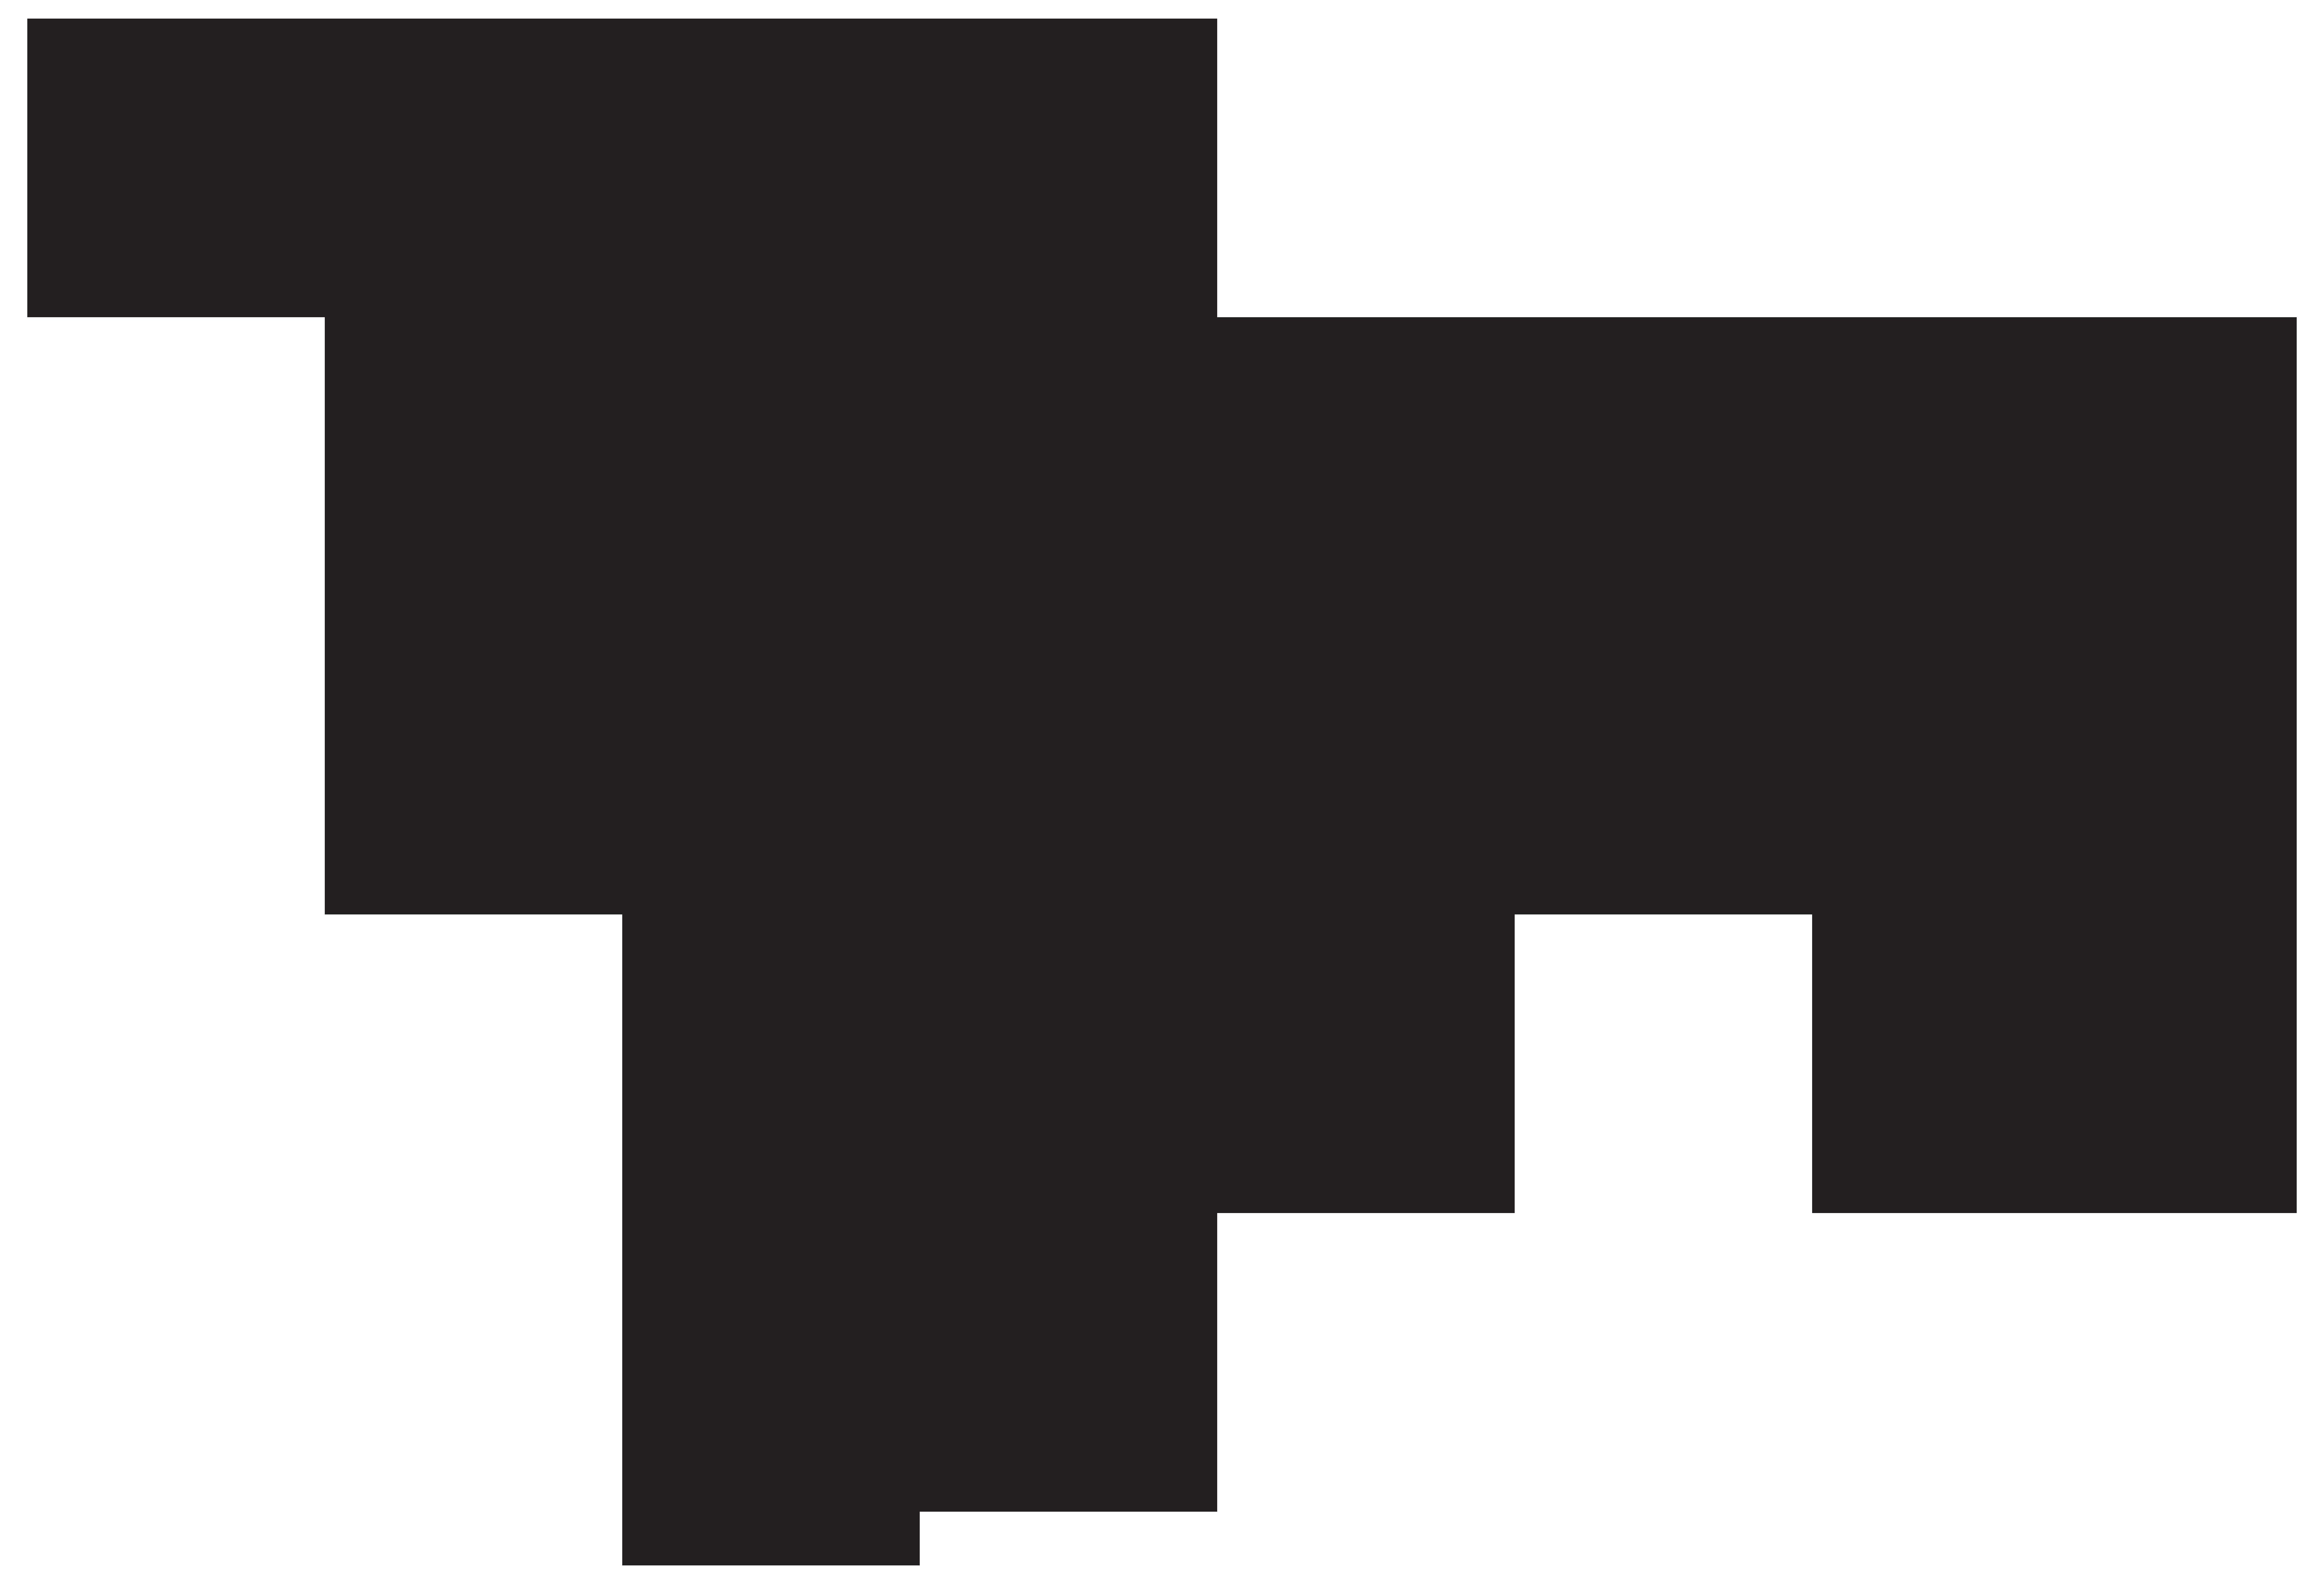 crow silhouette png clip art image sewing pinterest rh pinterest com